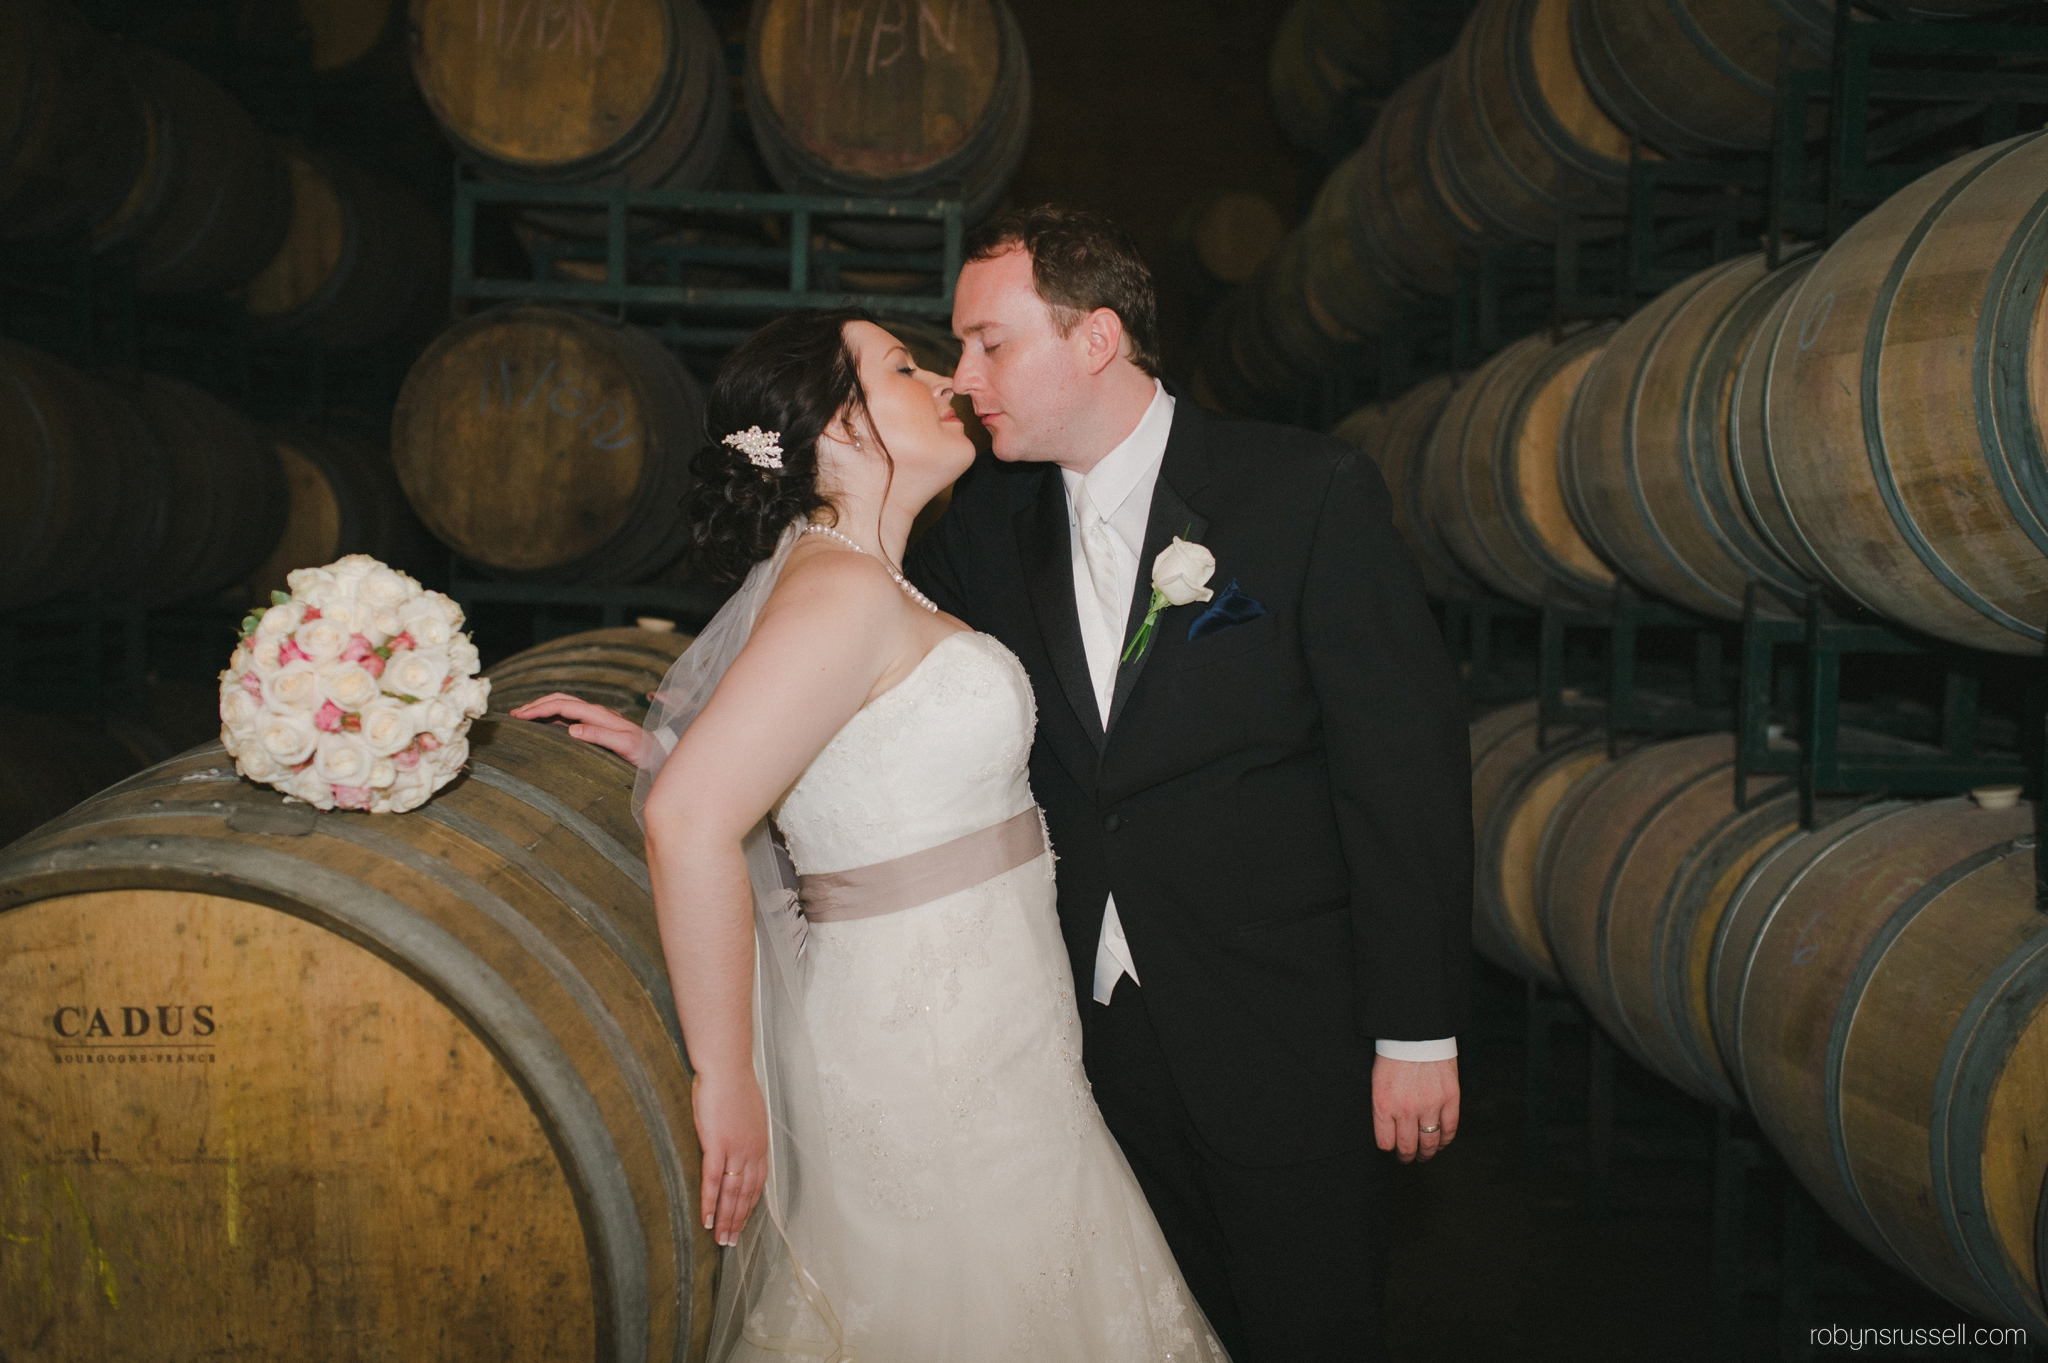 35-married-couple-in-wine-cellar-hernder-winery.jpg